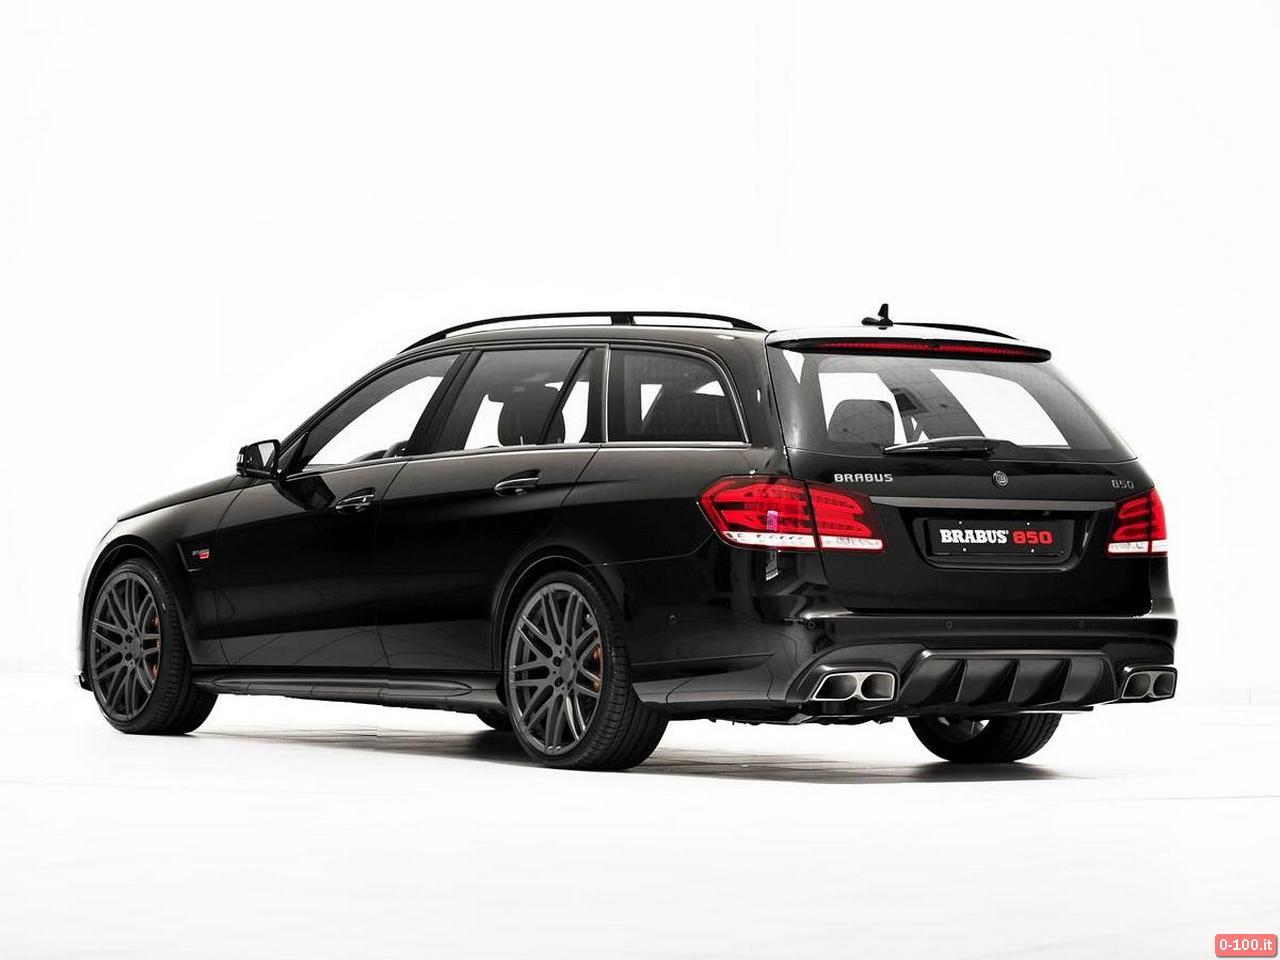 essen-motor-show-2013-brabus-850-mercedes e63-amg-station-wagon-0-100_19